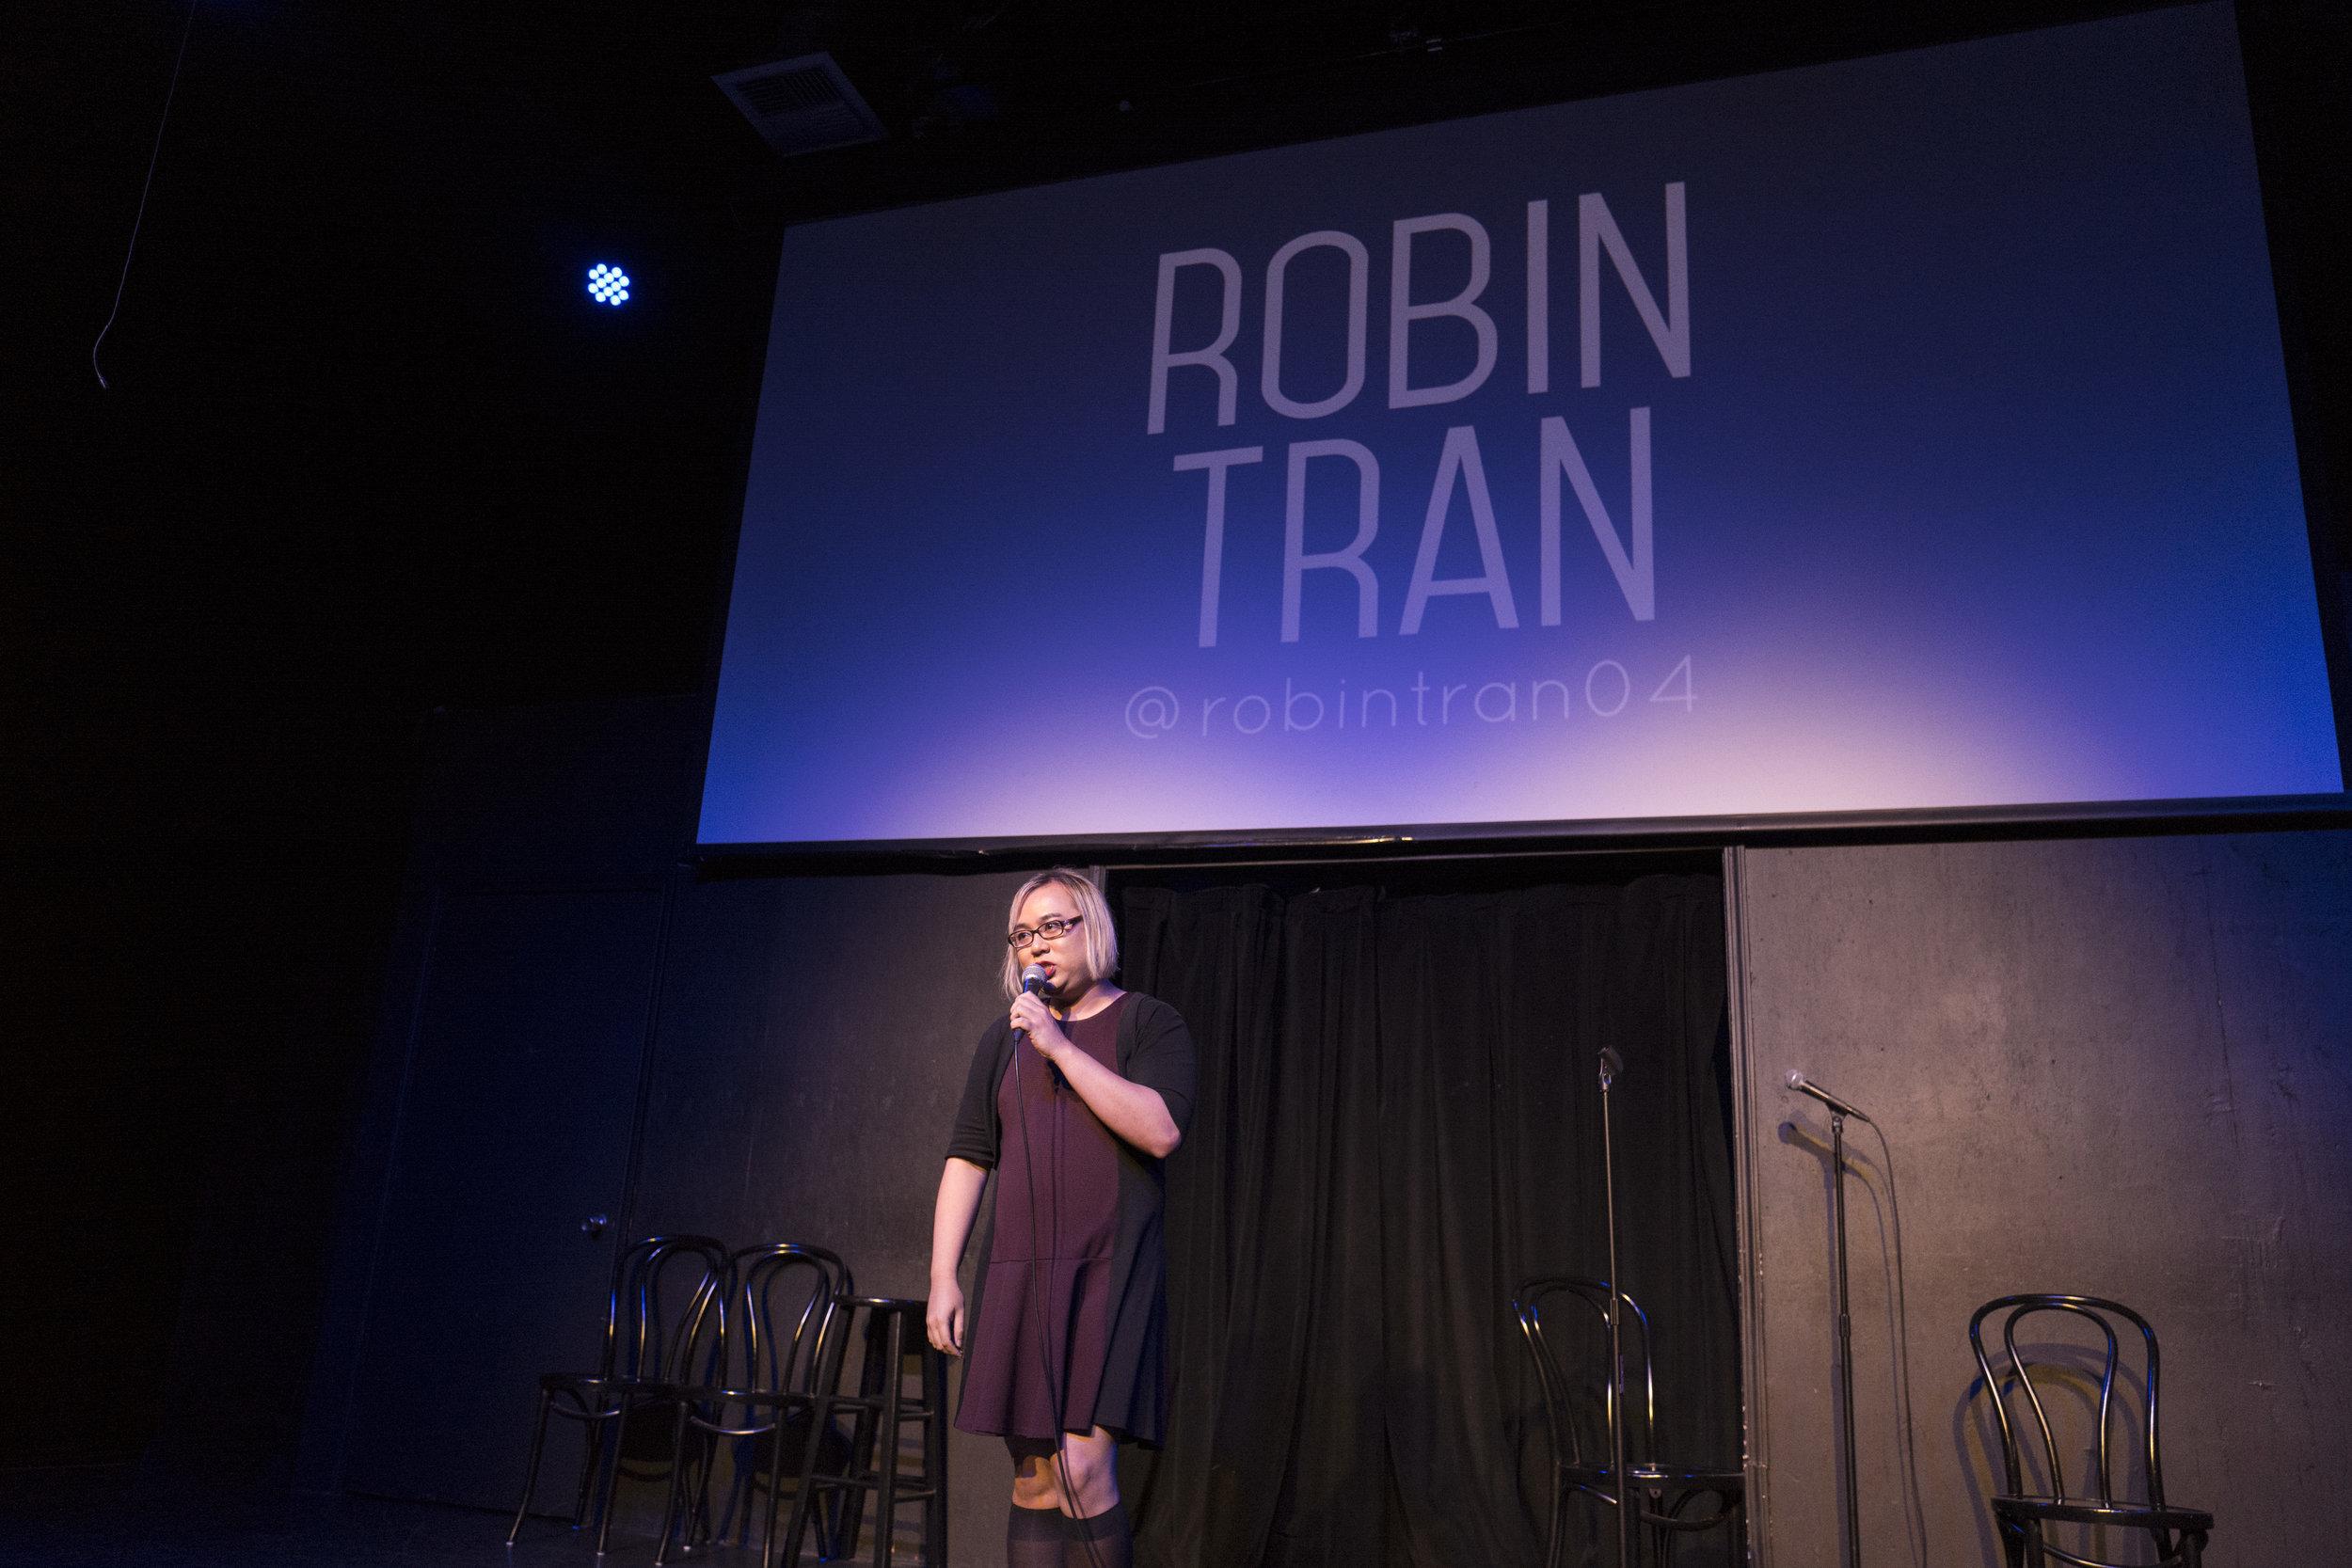 Robin Tran